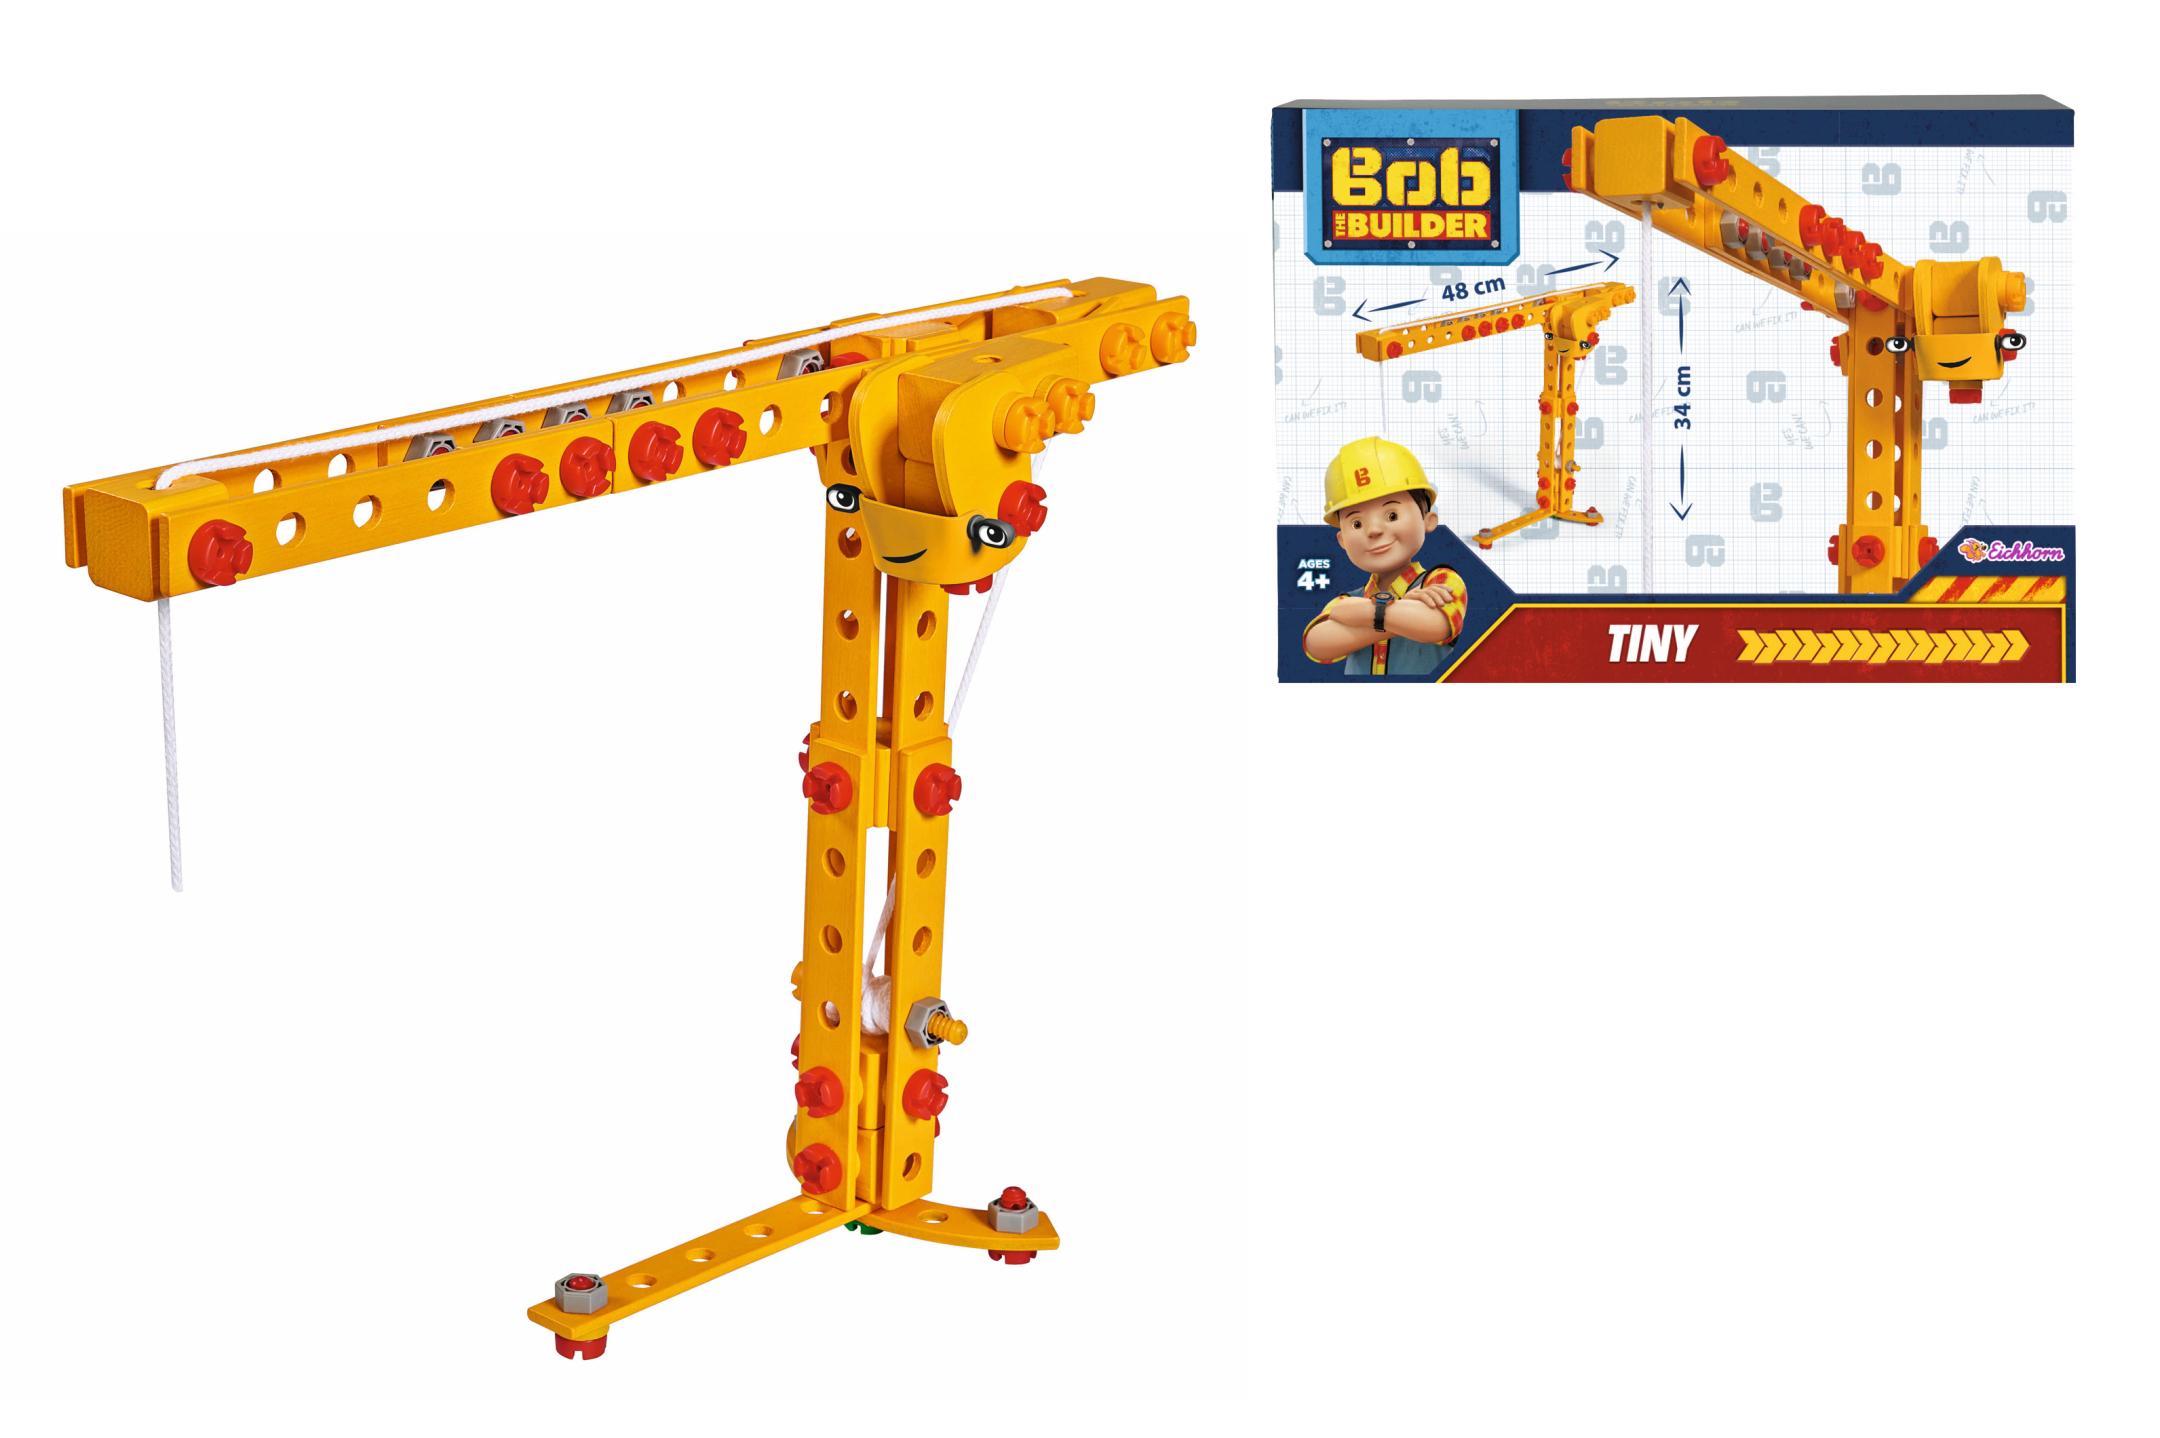 Bob der Baumeister Kran Tiny